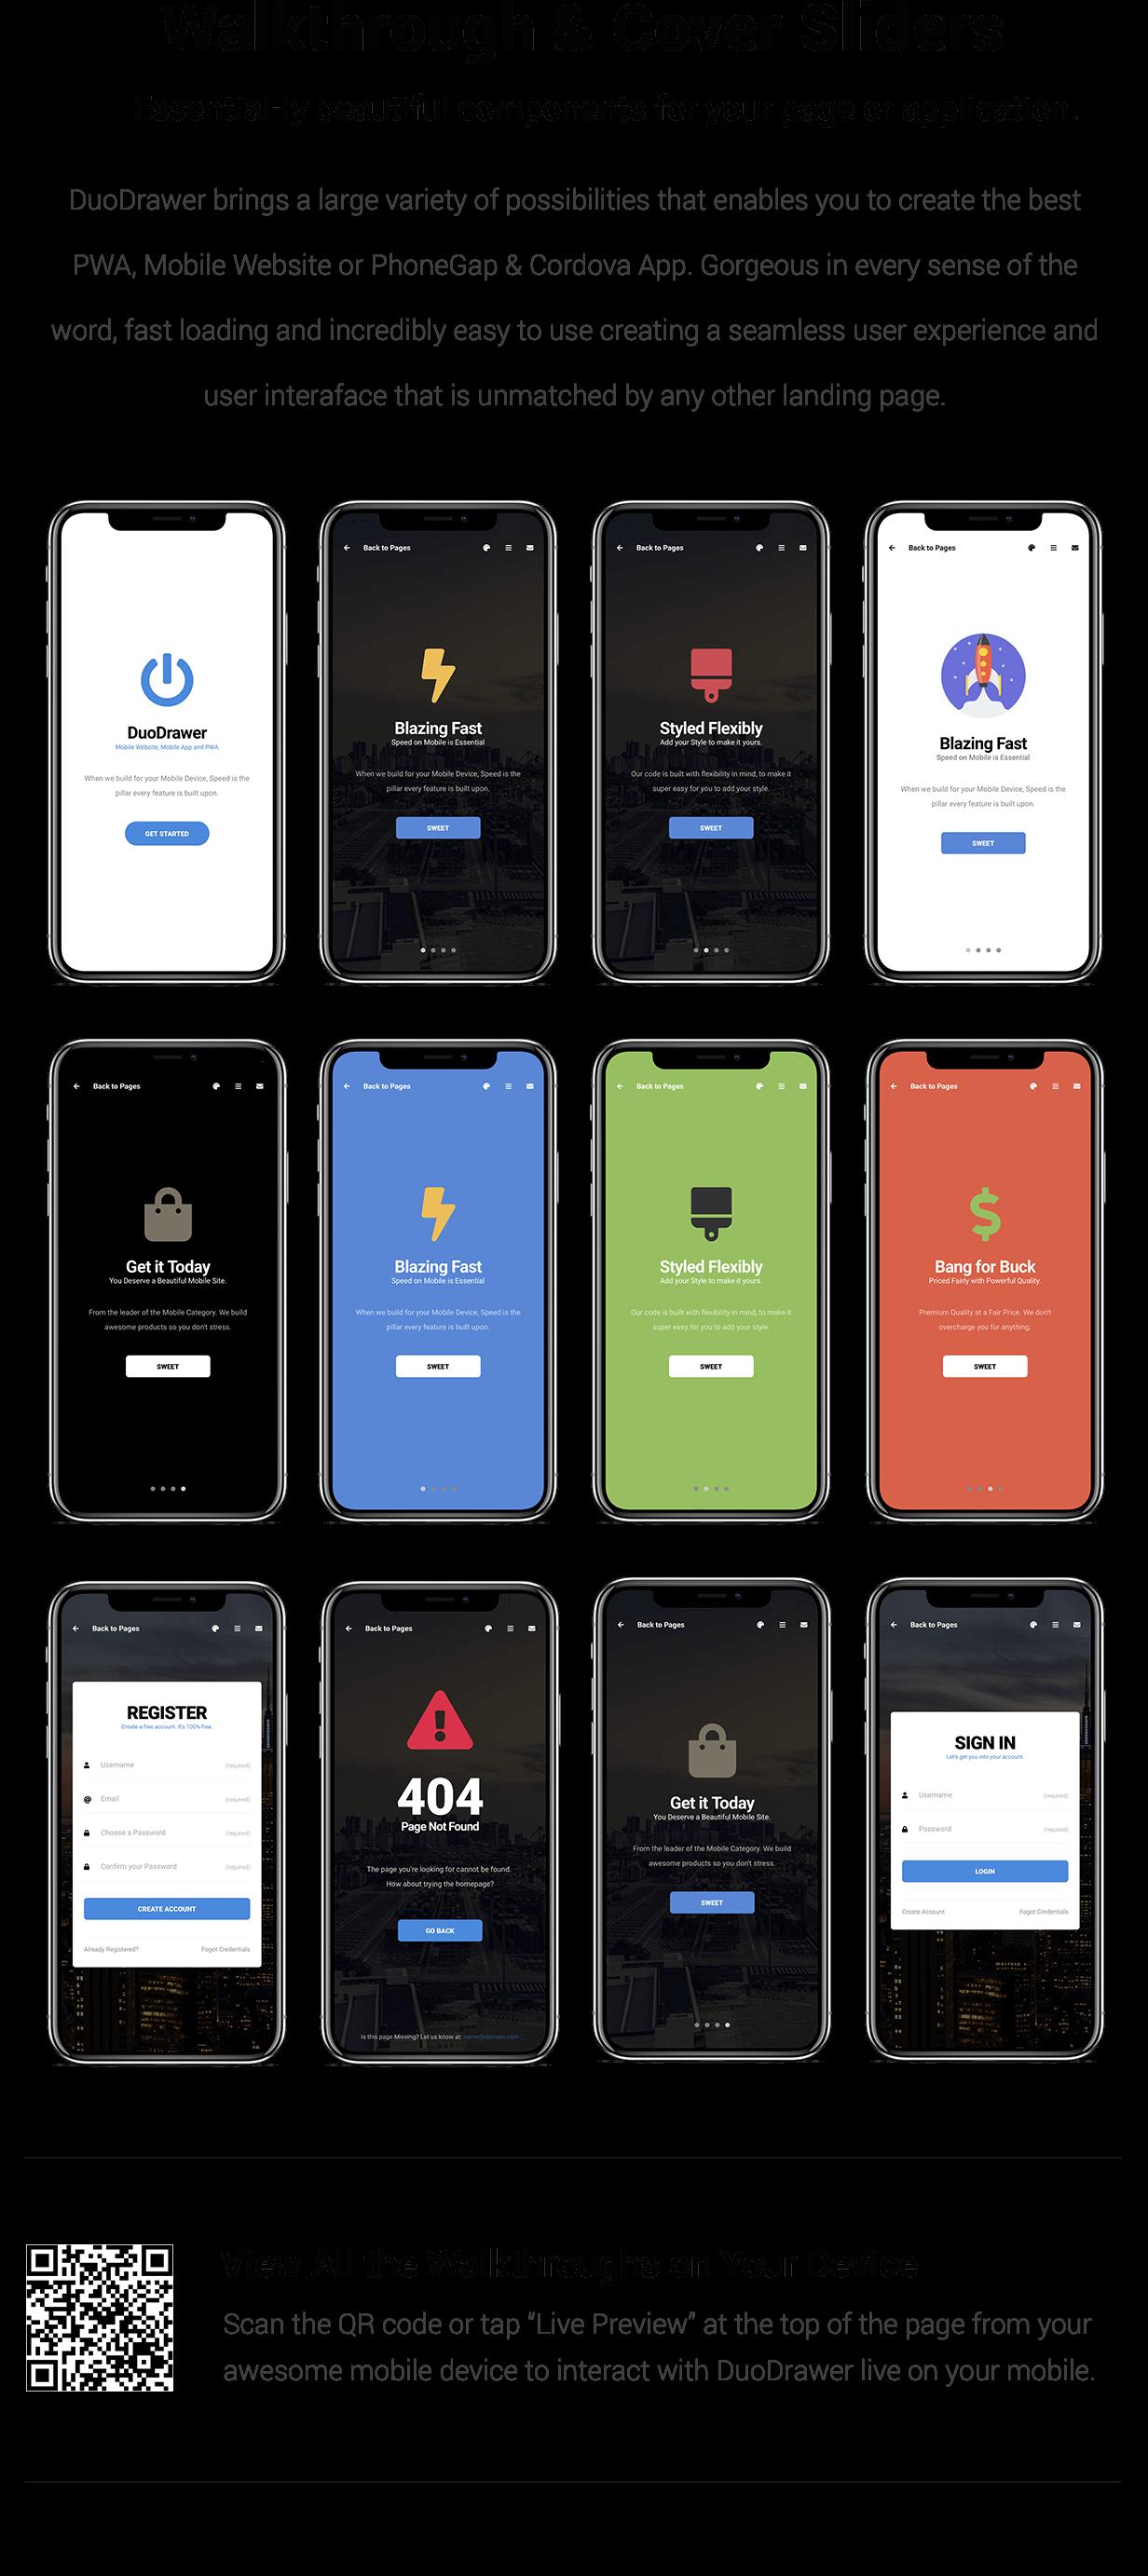 DuoDrawer Mobile   PhoneGap & Cordova Mobile App - 16